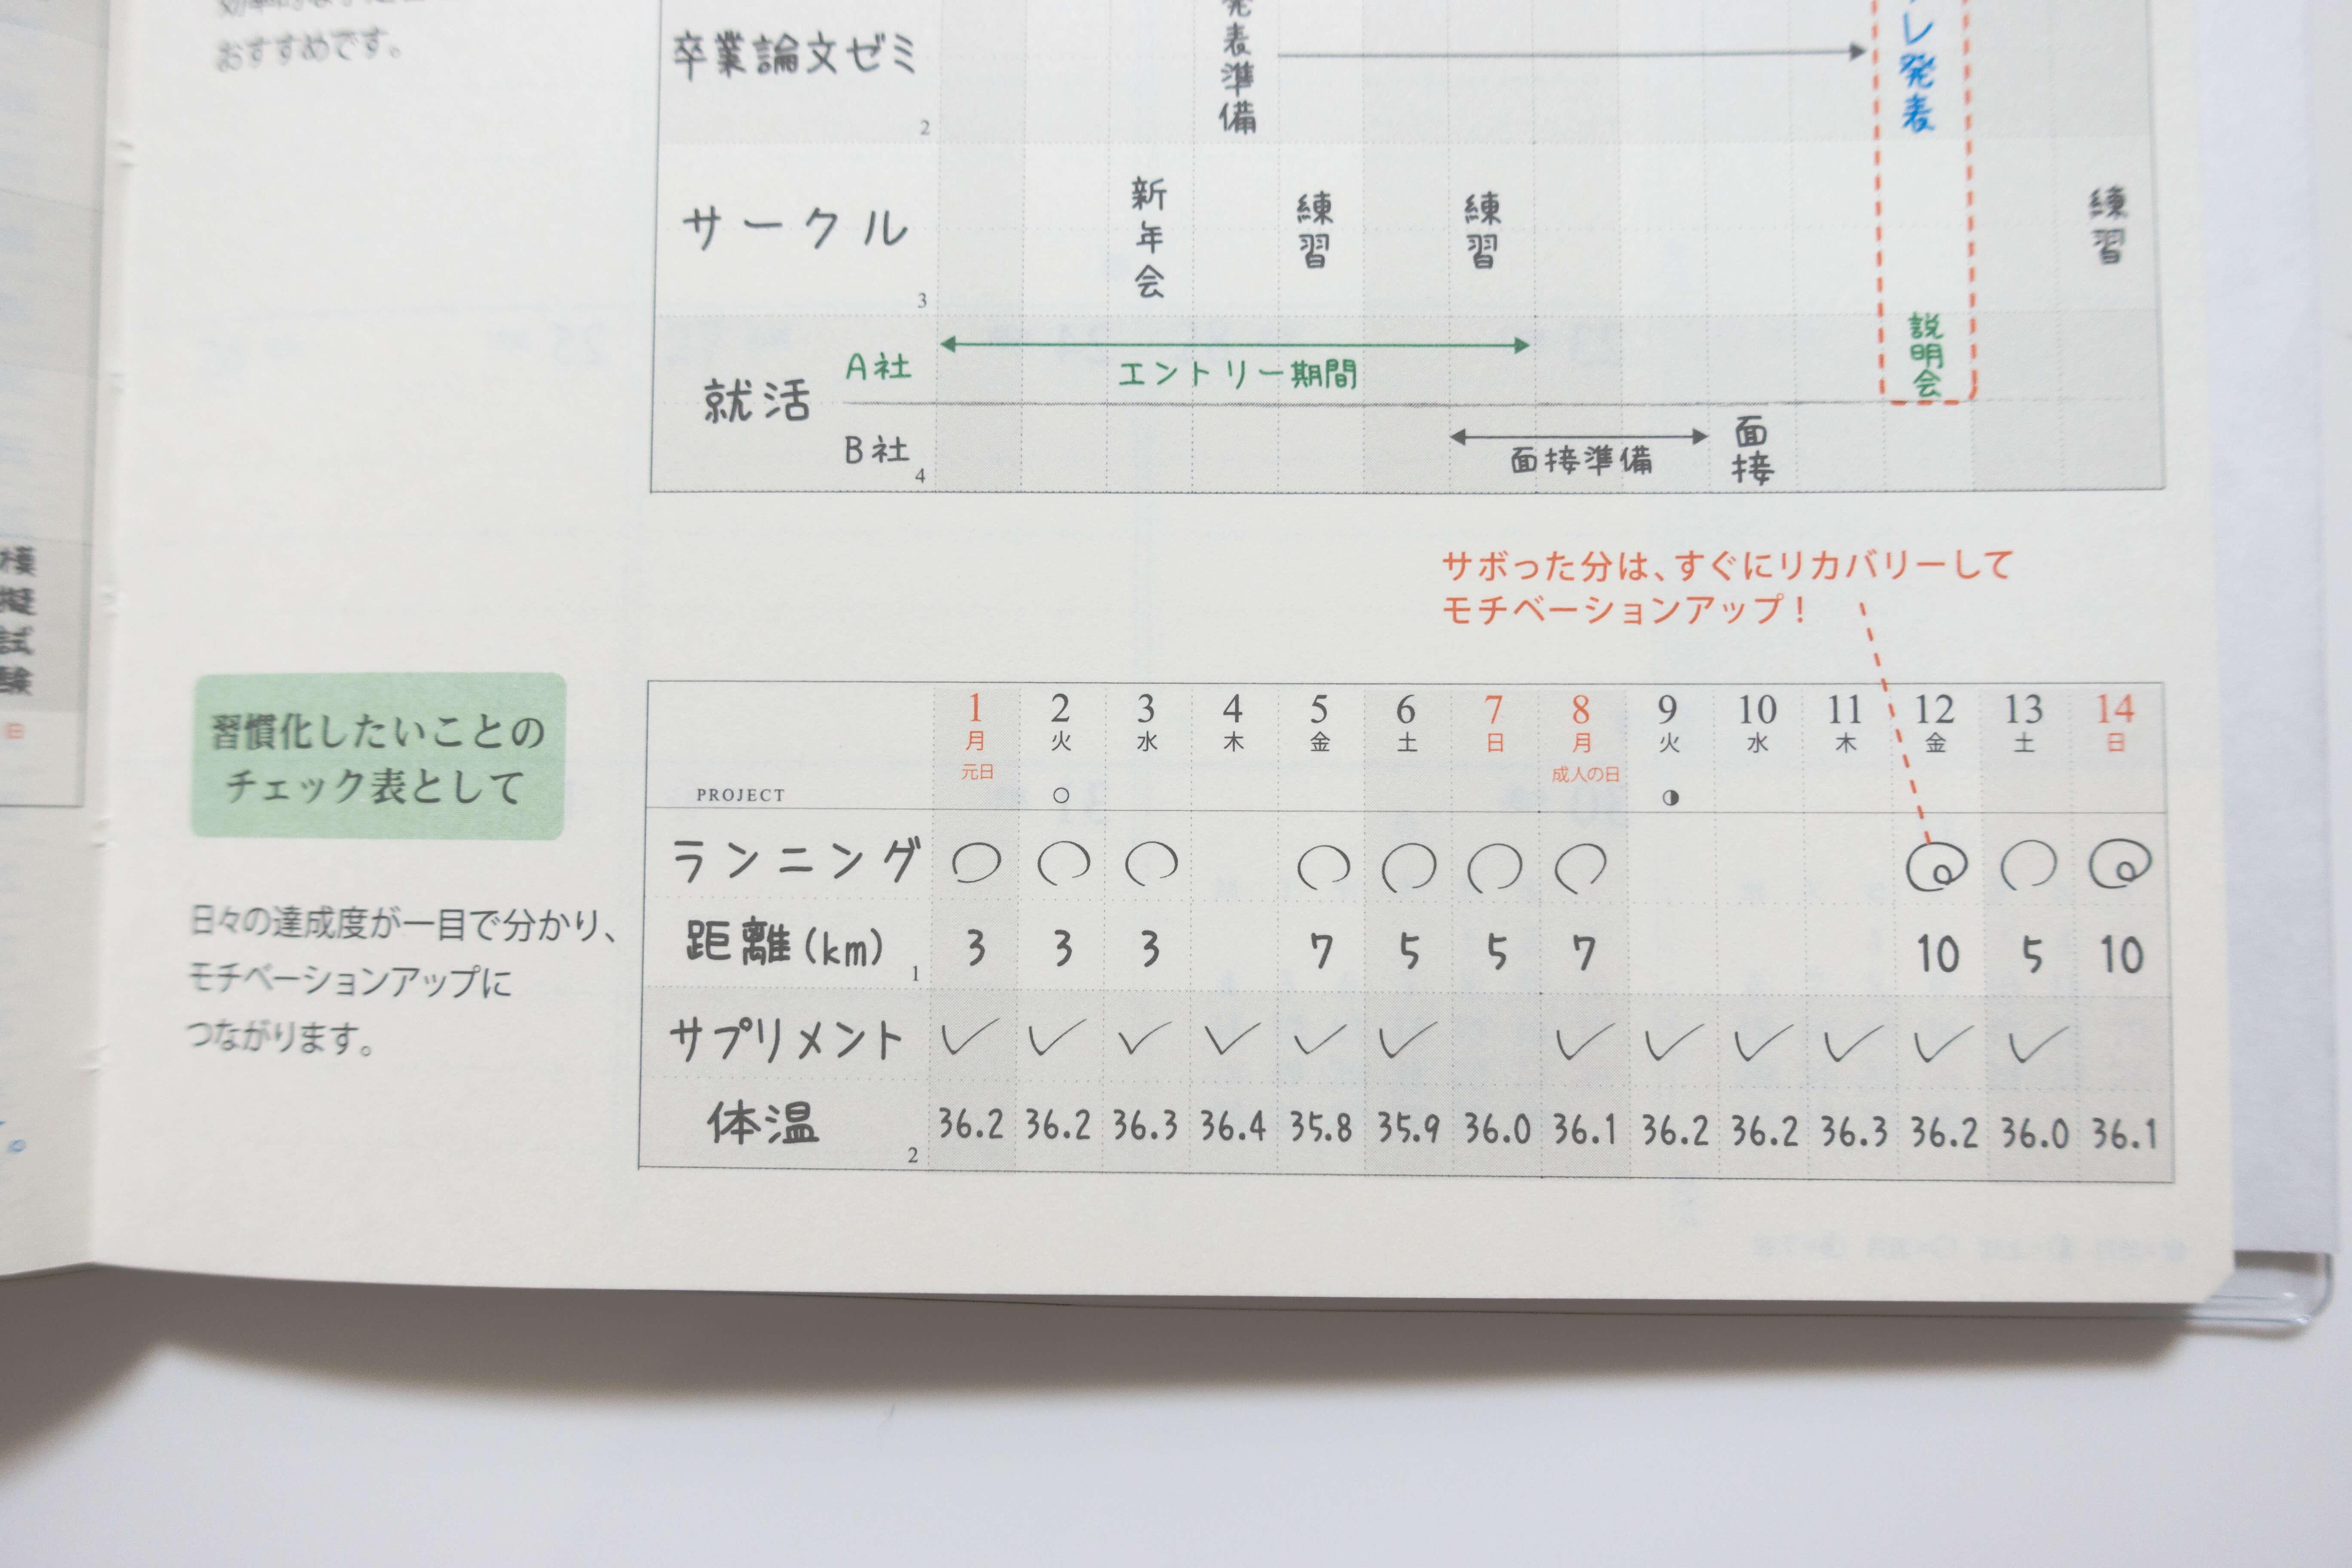 180107 gant chart diary 09